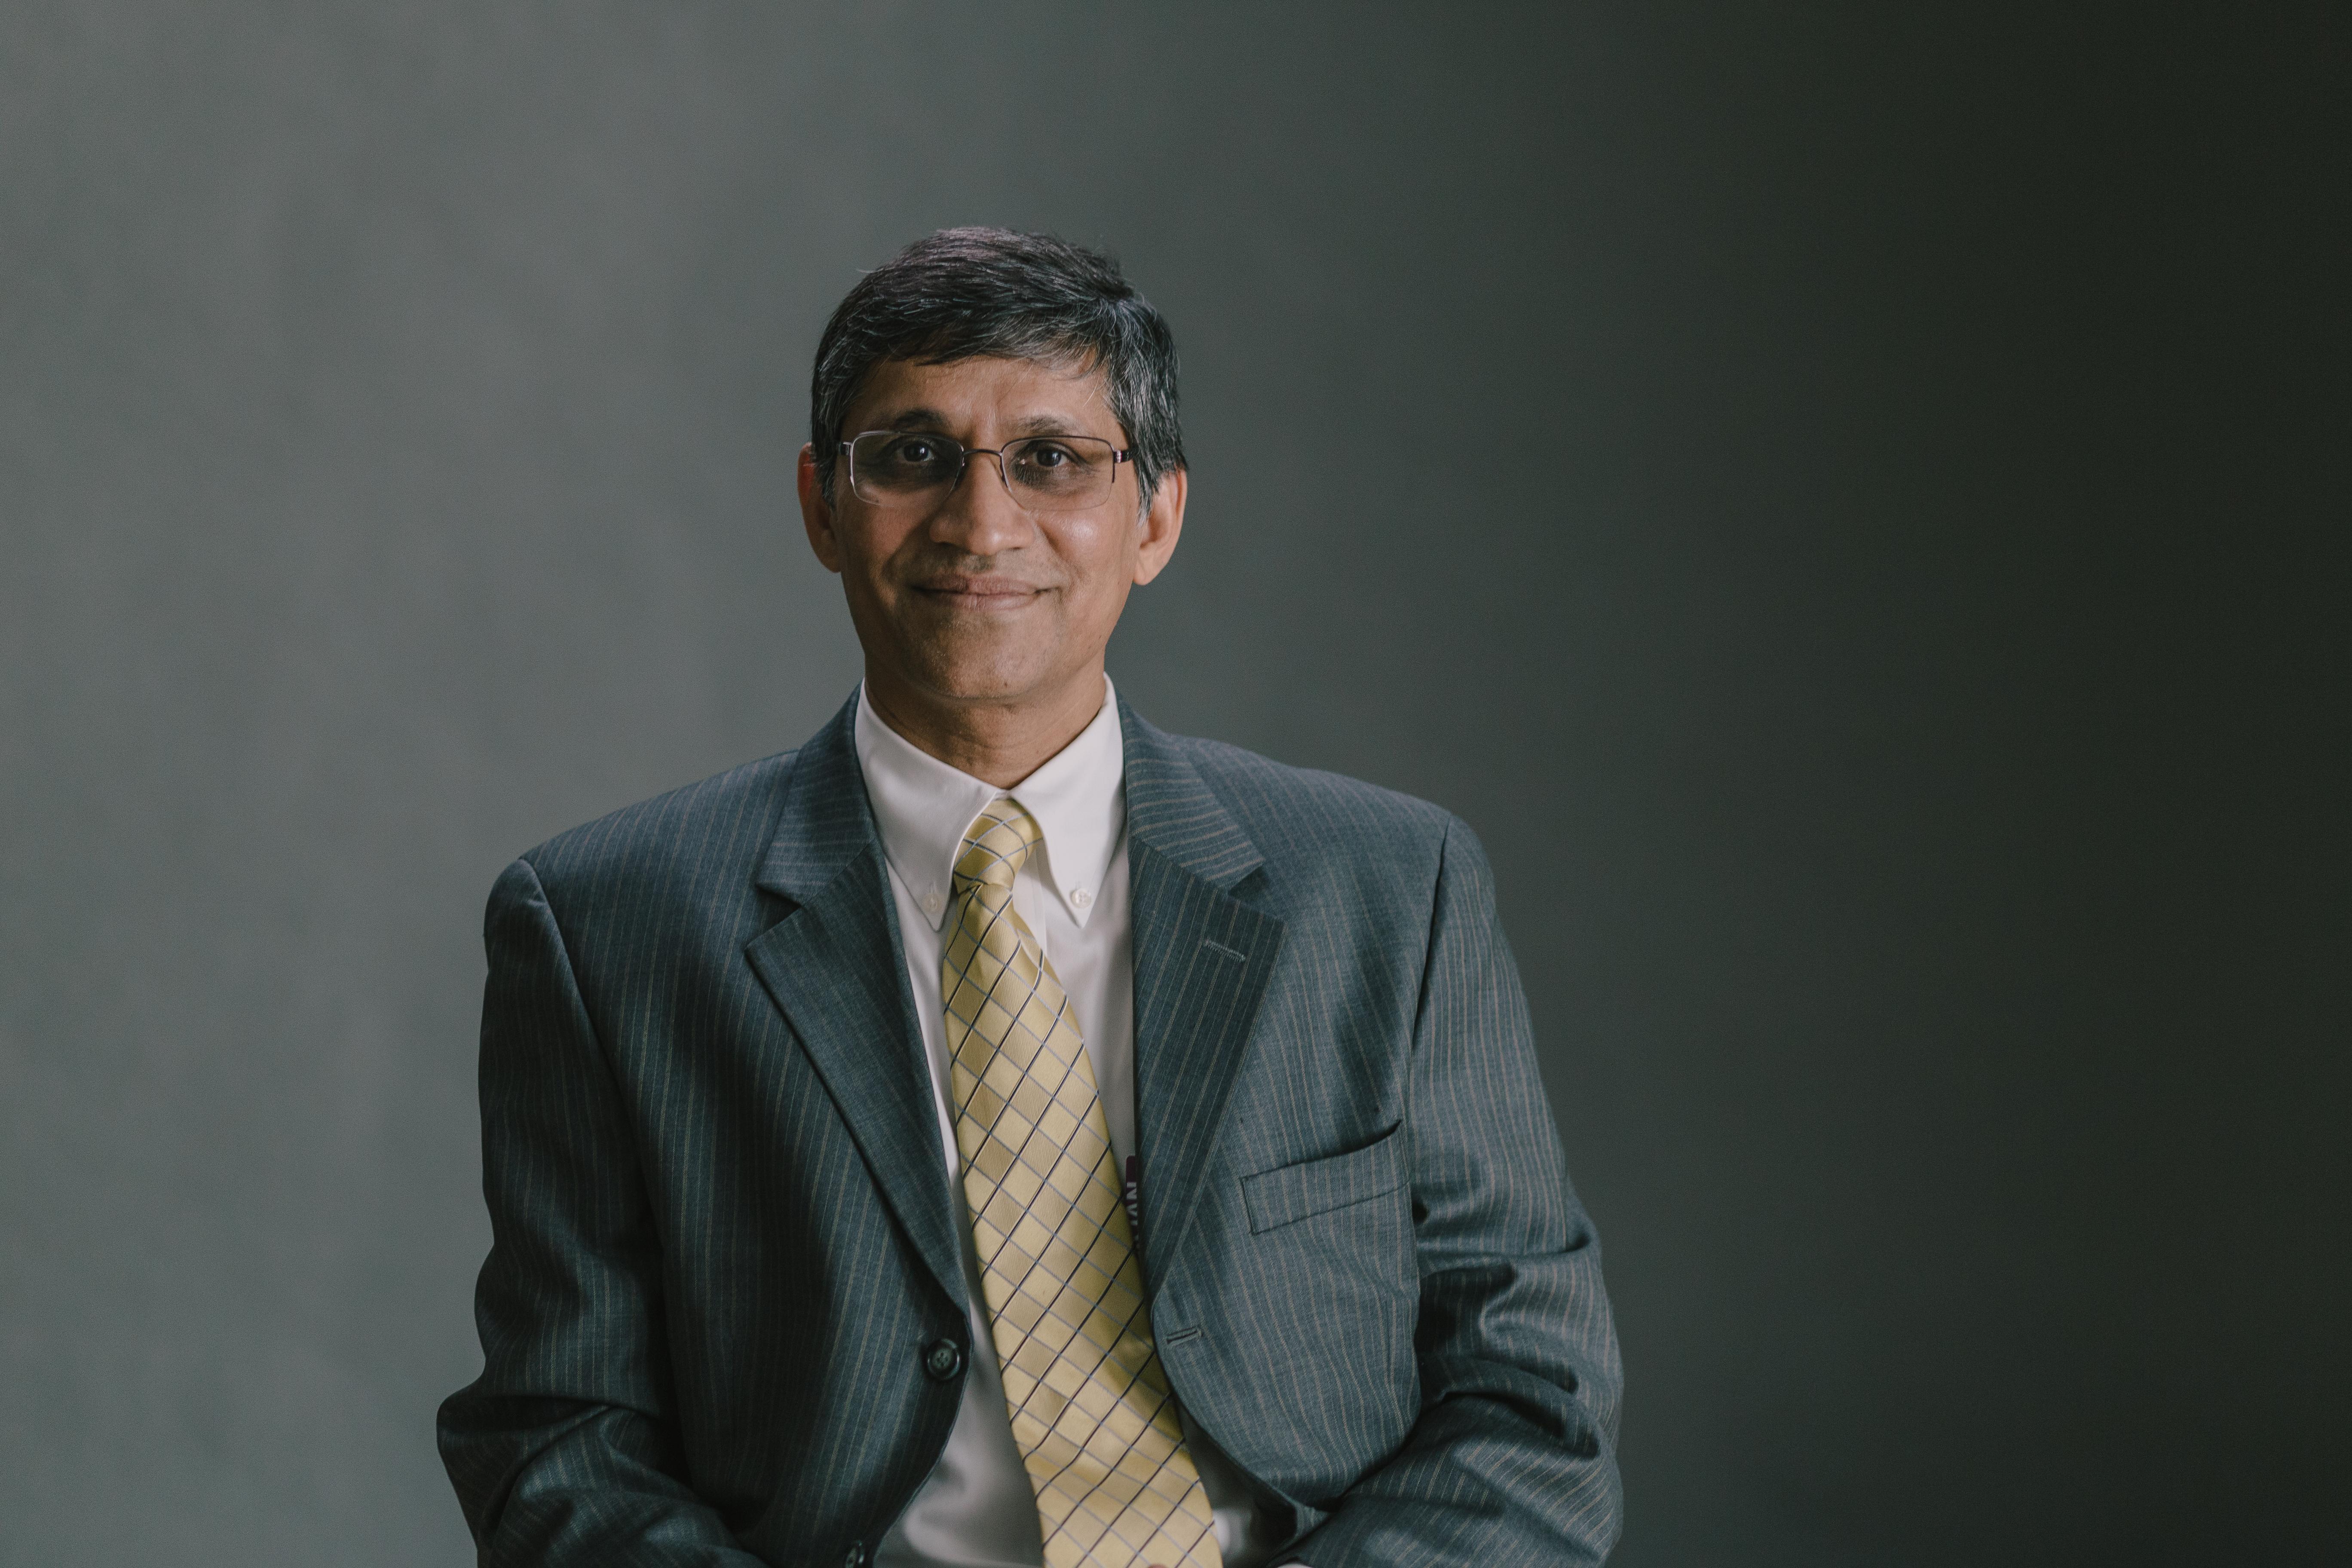 Vinay Vaidya, Chief Medical Information Officer at Phoenix Children's Hospital